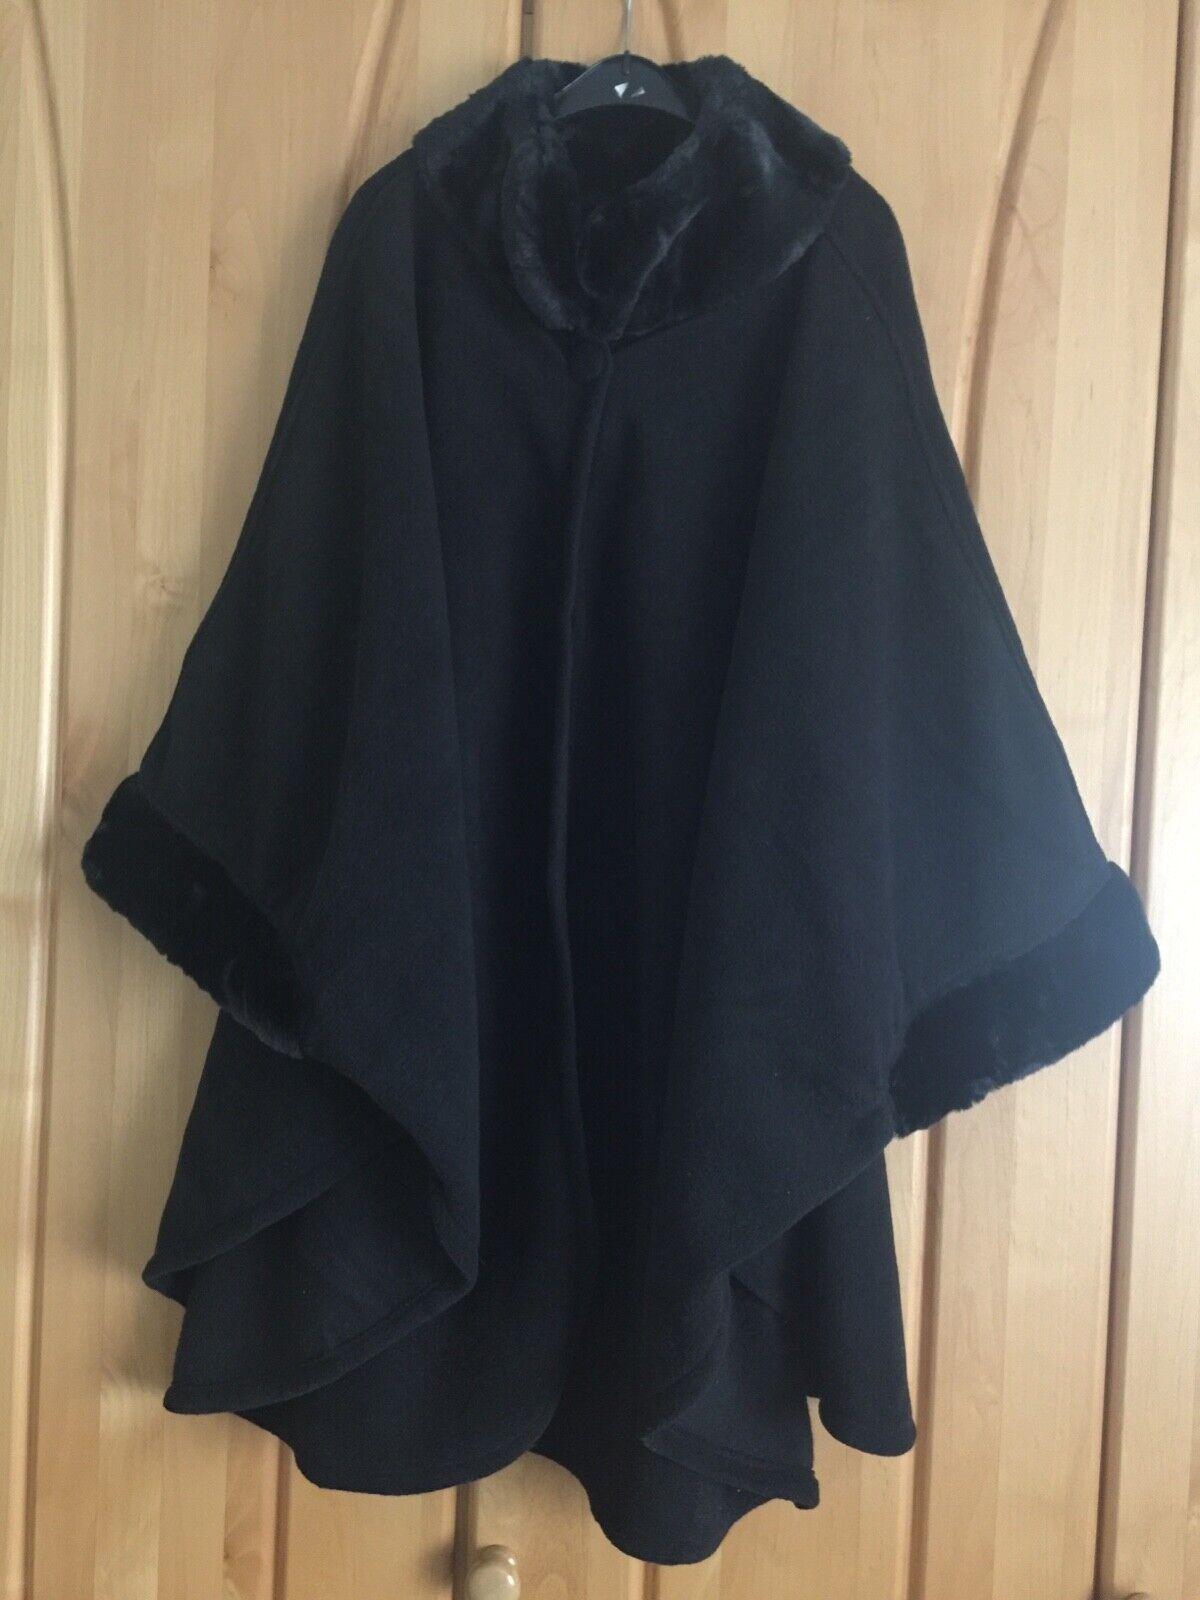 Damen Poncho Cape schwarz one size bis XL